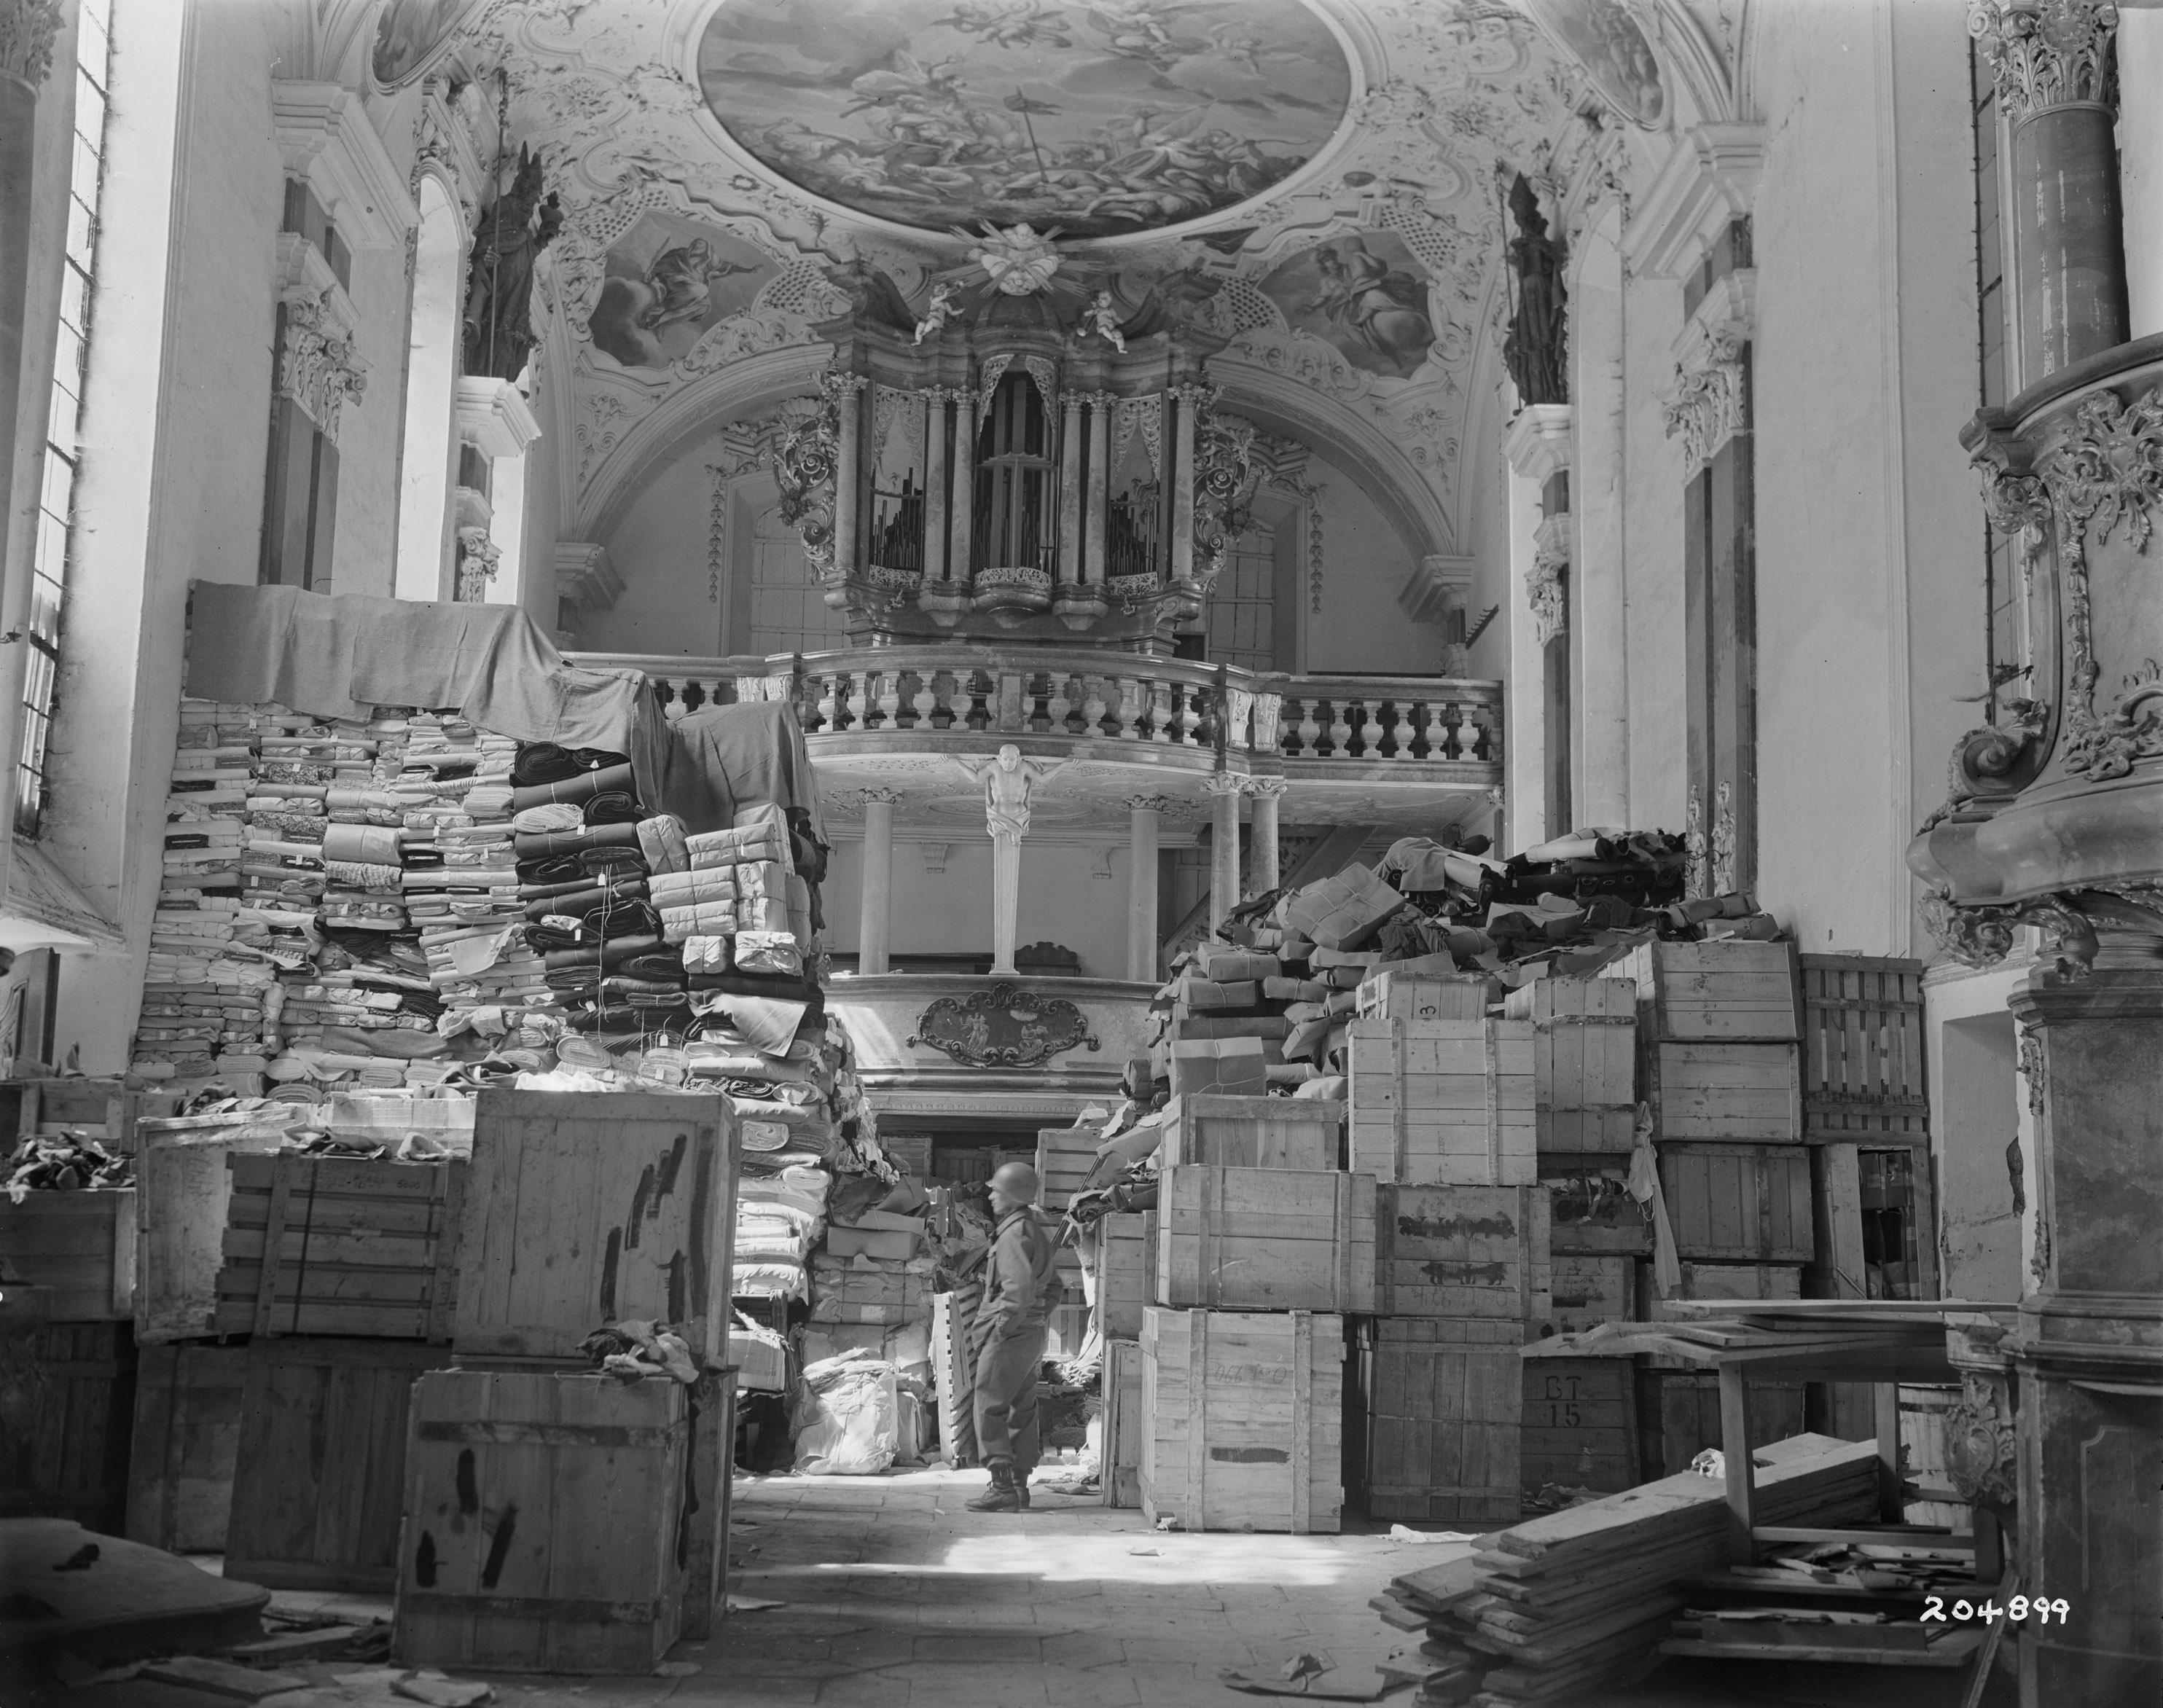 looted_art_german_loot_stored_at_schlosskirche_ellingen_ellingen_bavaria_germany.jpg